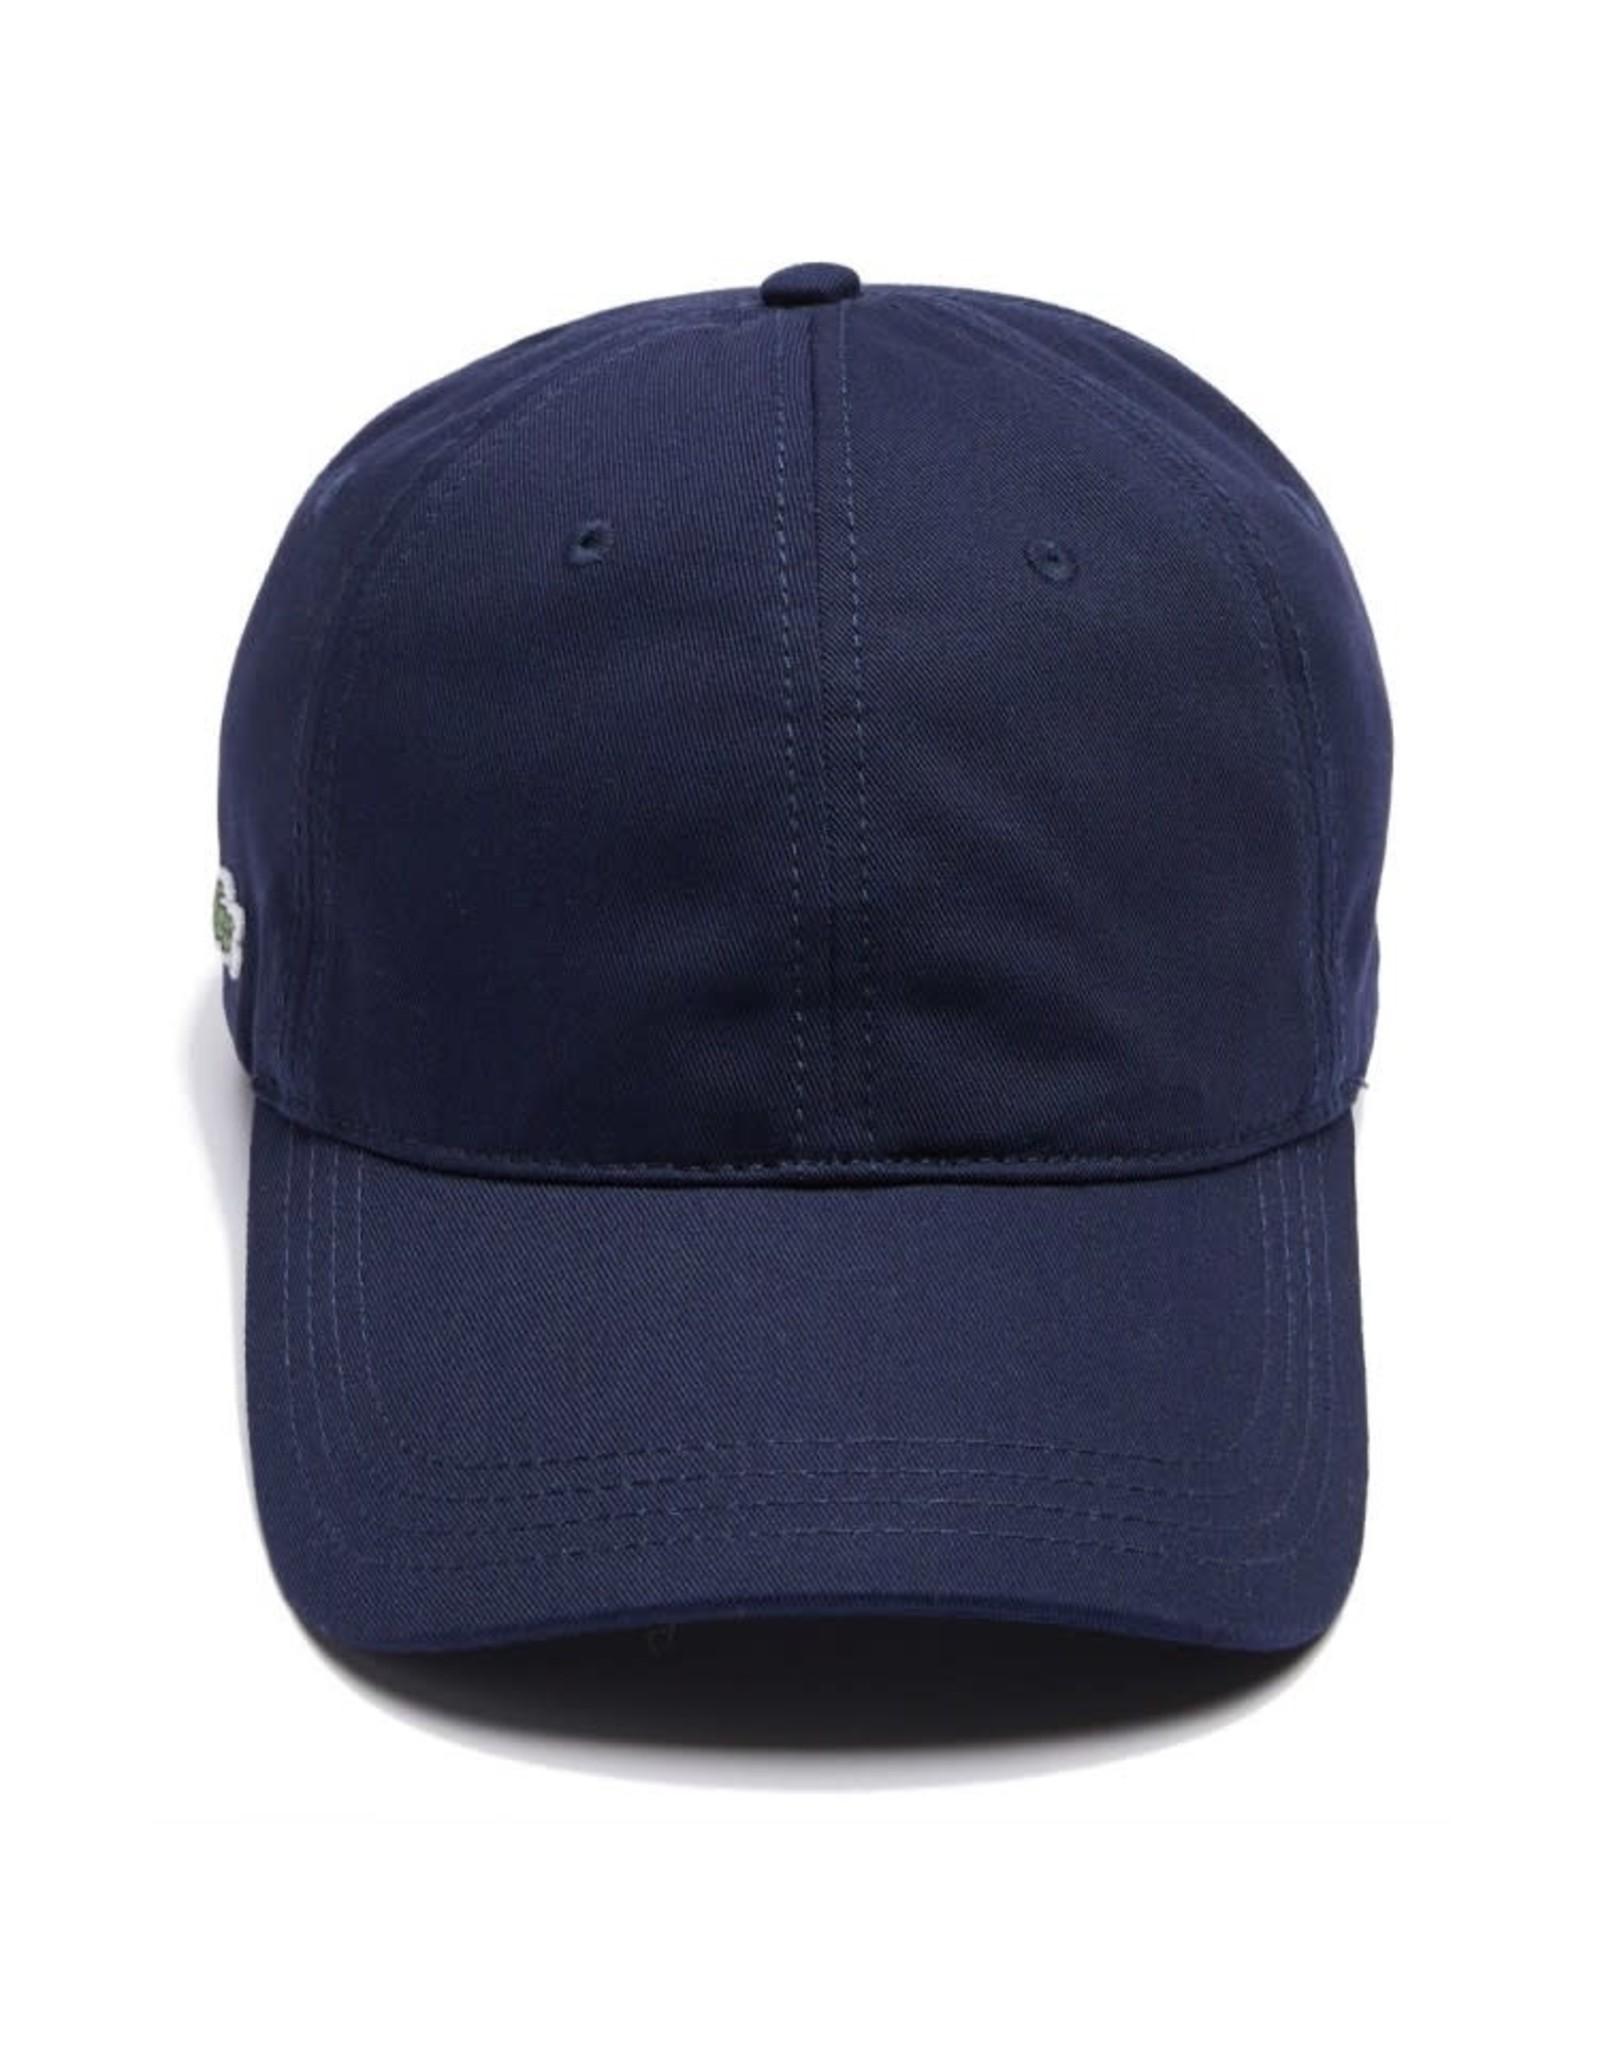 Lacoste Lacoste Cap navyblue 2